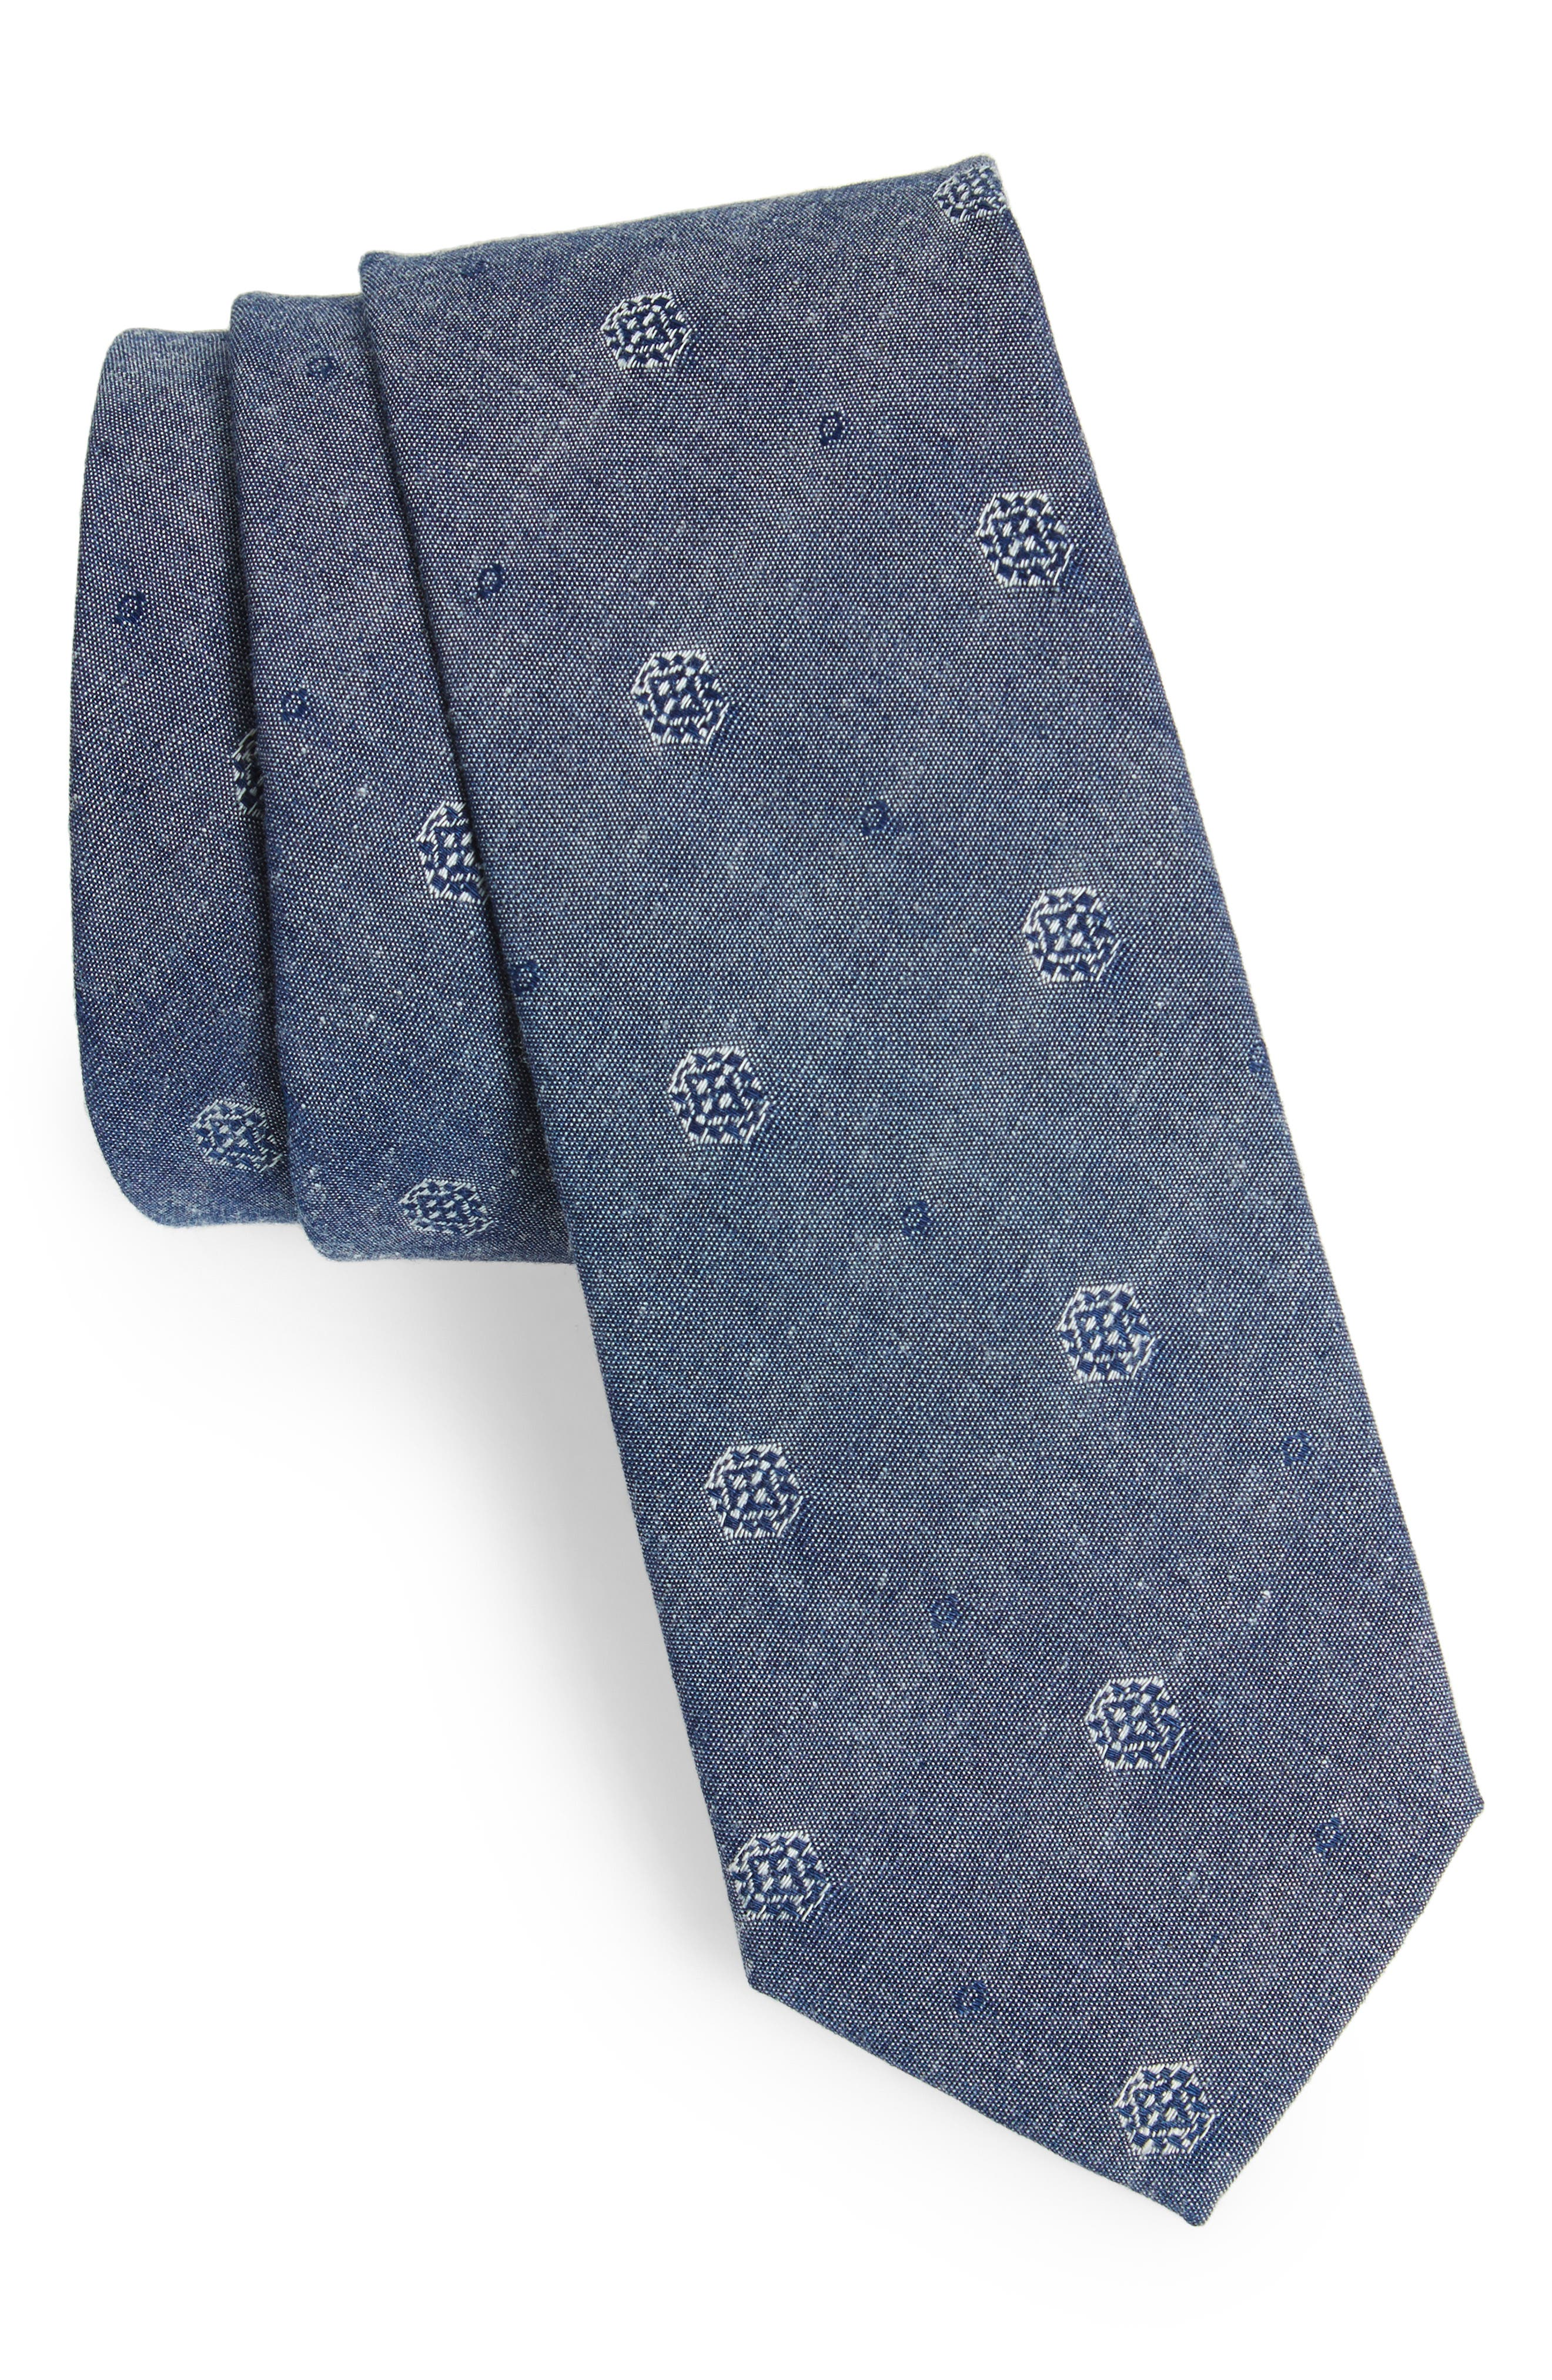 Medallion Cotton Tie,                             Main thumbnail 1, color,                             Navy